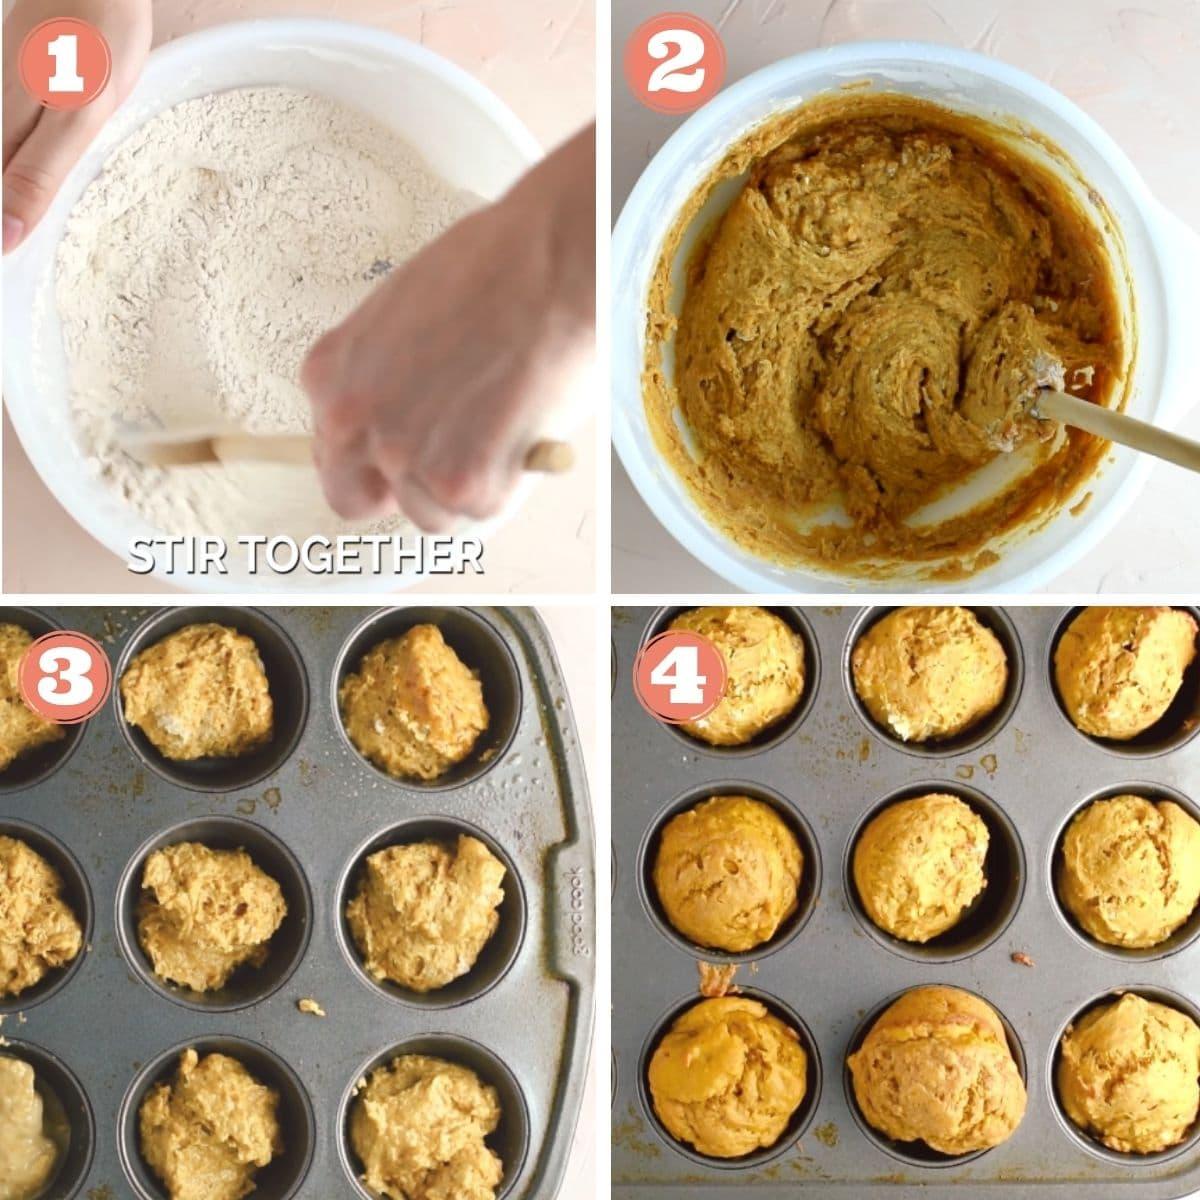 Steps 1 through 4 to make pumpkin muffins